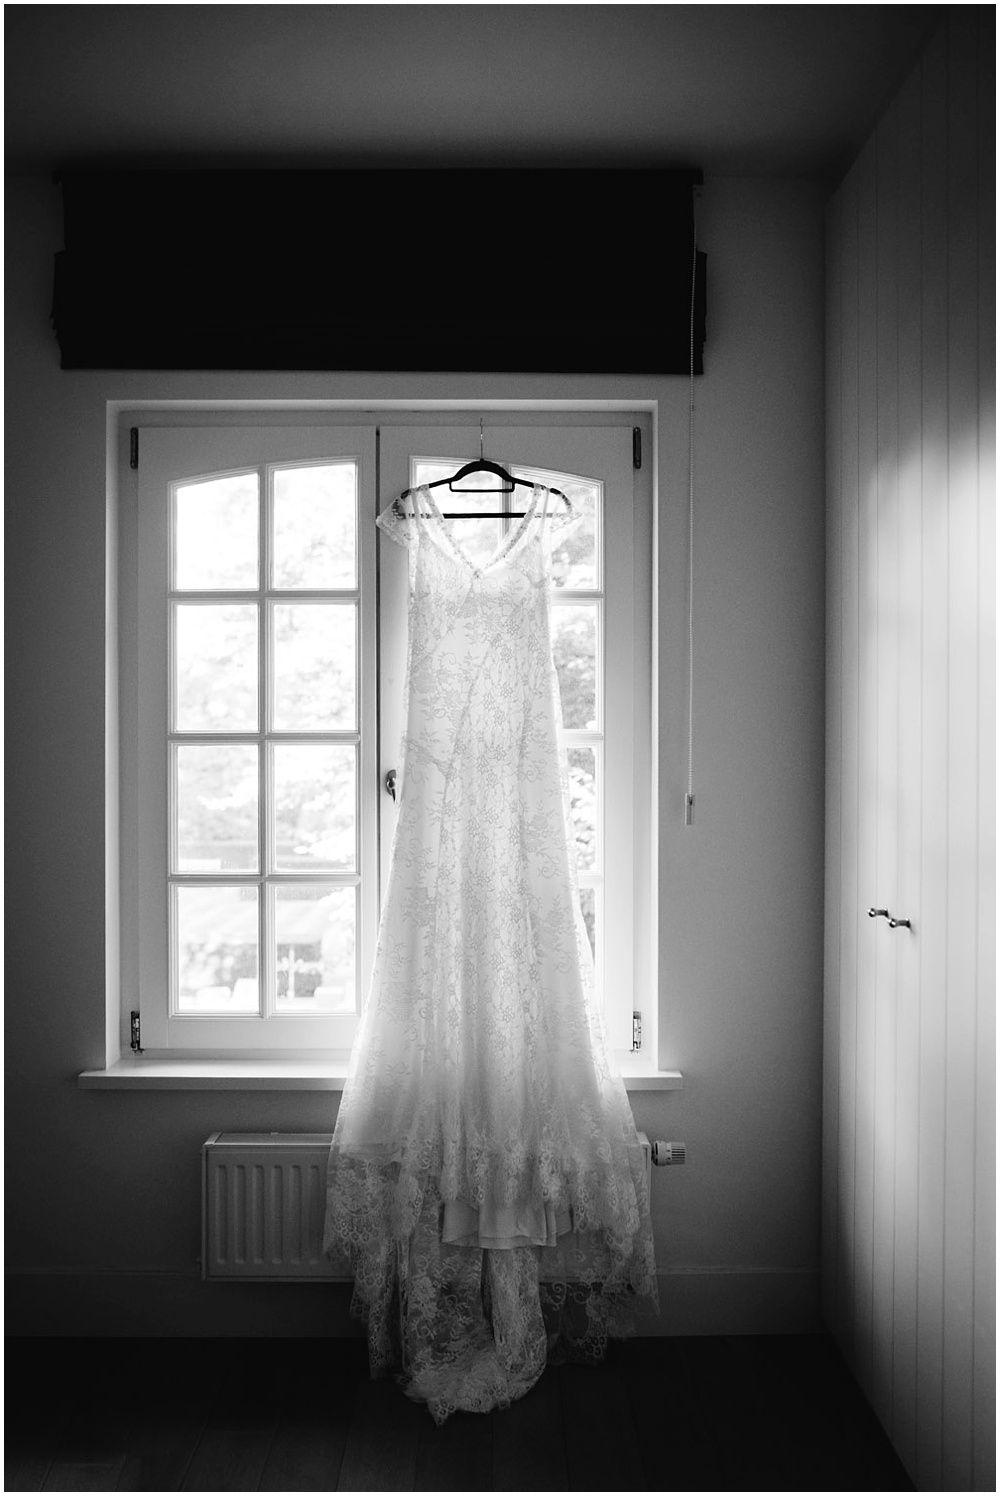 Izzy Fotografie - bruidsreportage Eindhoven J en R 028.jpg